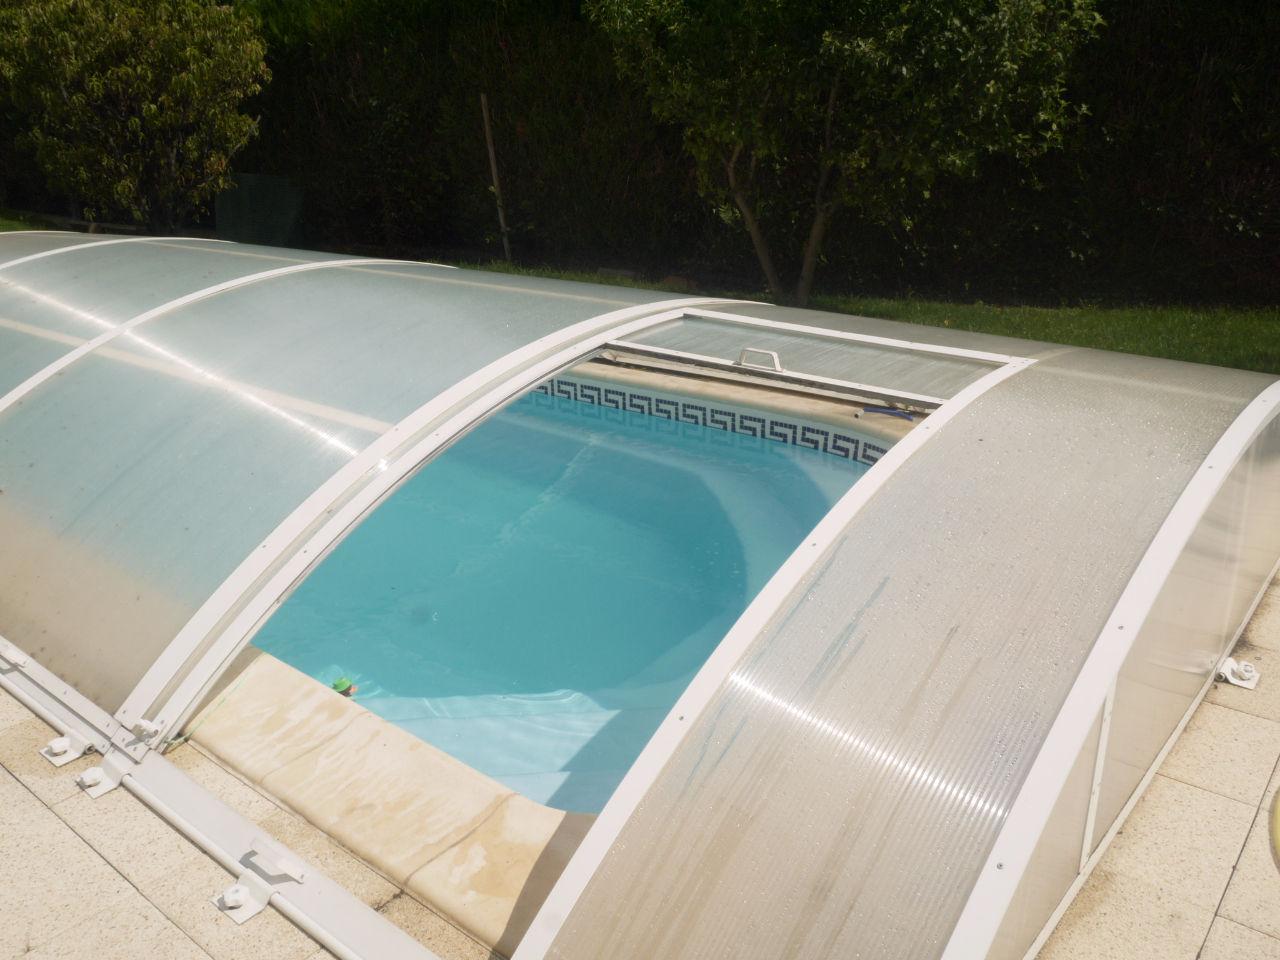 A acheter maison familiale avec 3 chambres et piscine for Piscine a acheter